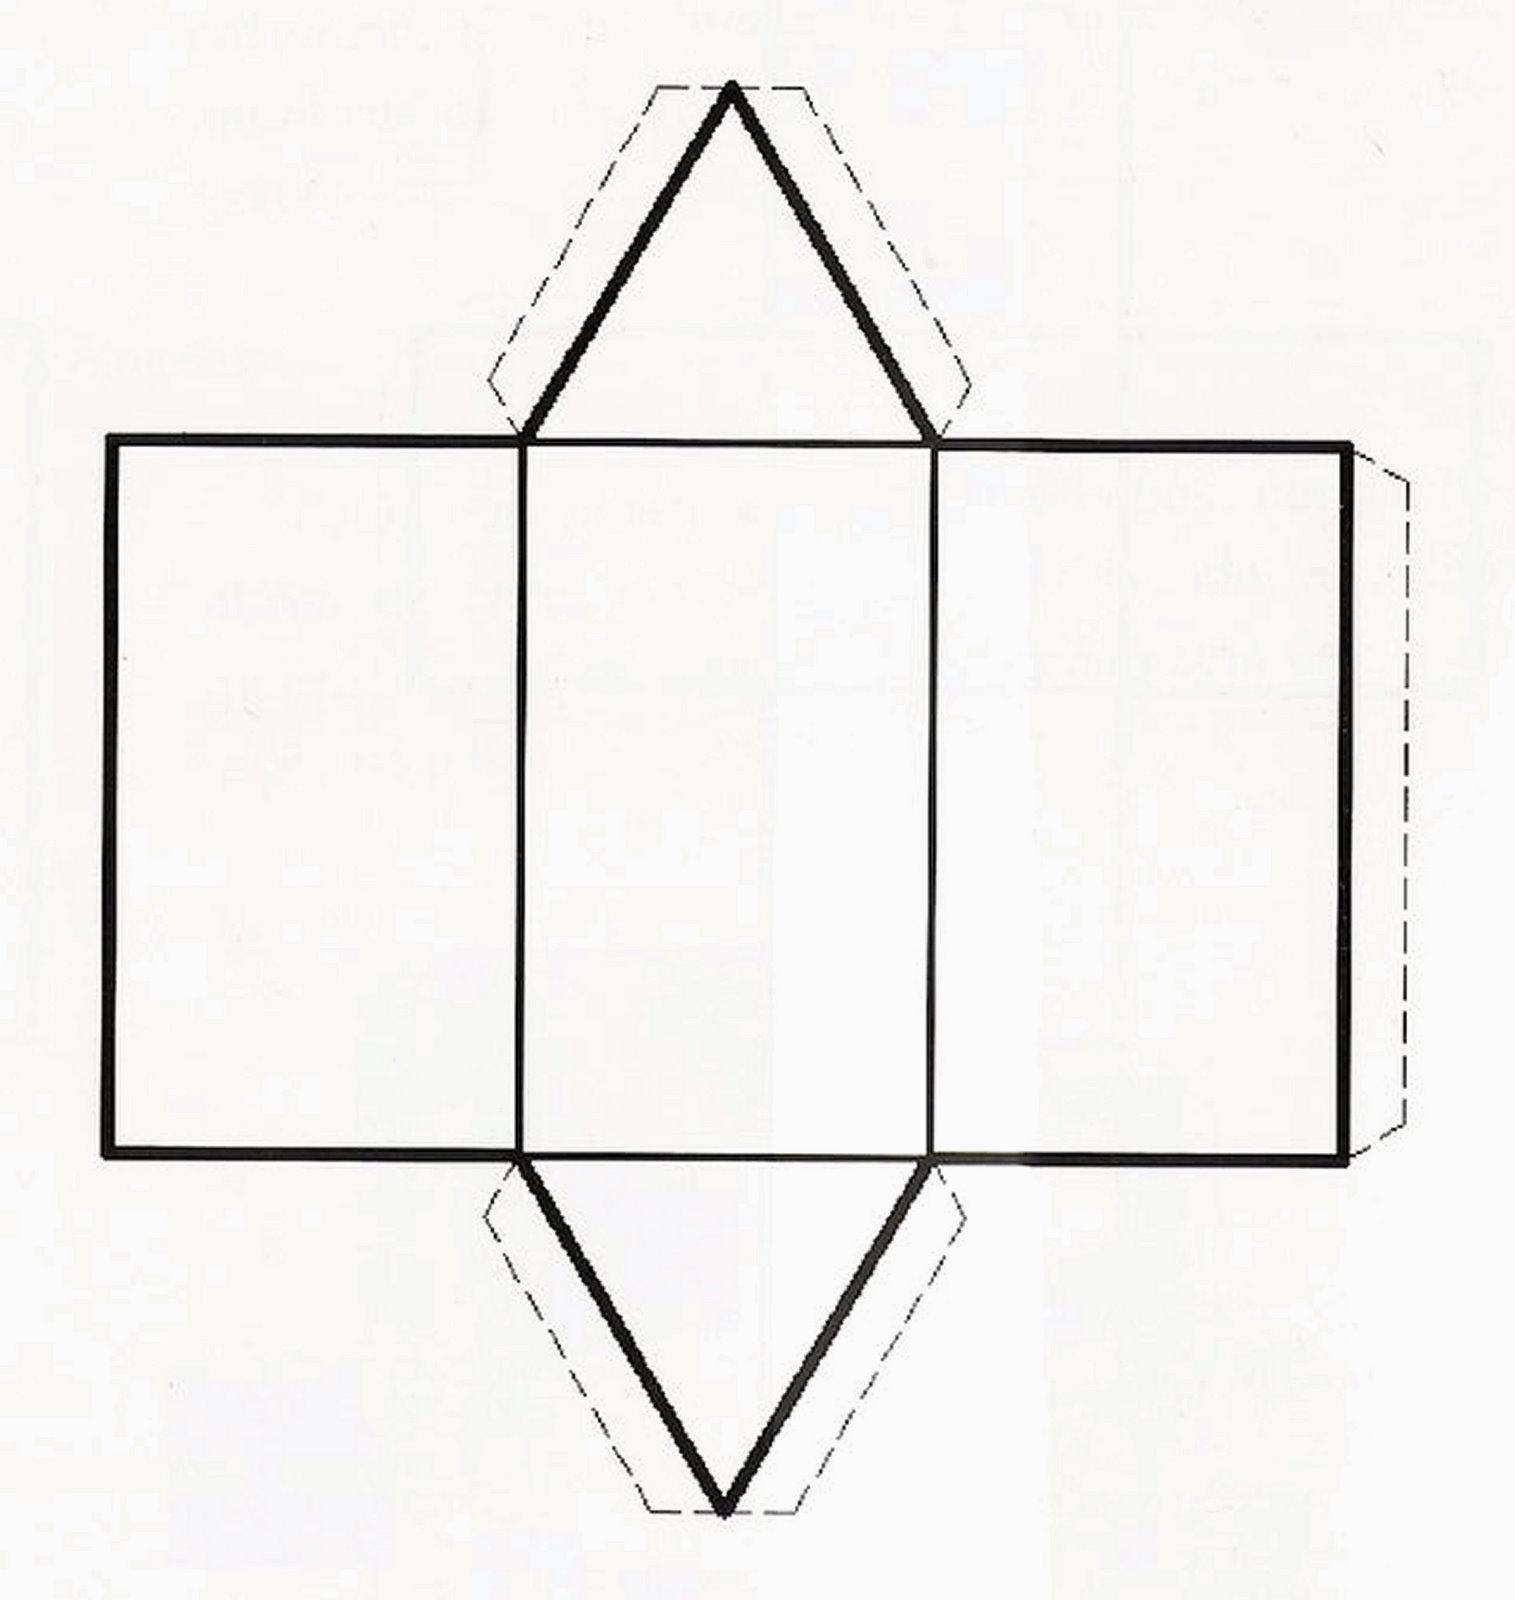 Sphaira: Prisma triangular